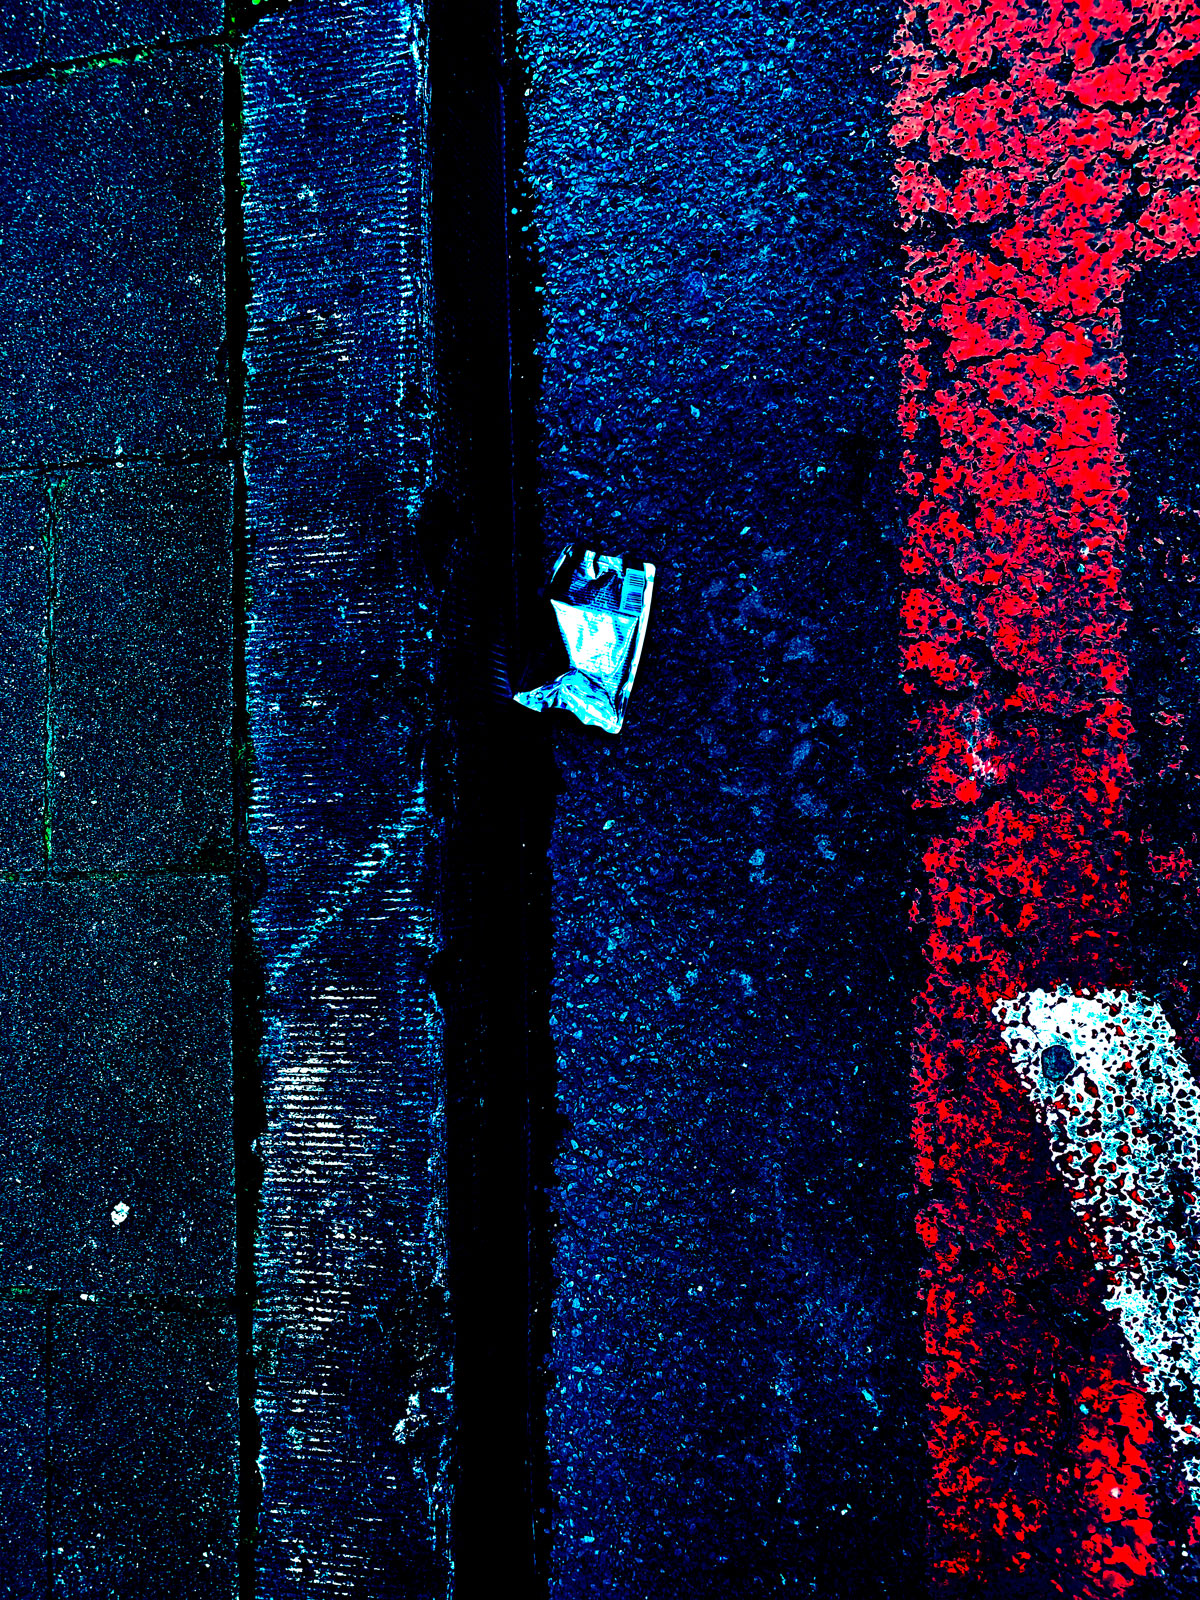 Lost & Found - Pimped Garbage 03 • 52.5 x 70 cm (20.67 x 27.56 in)